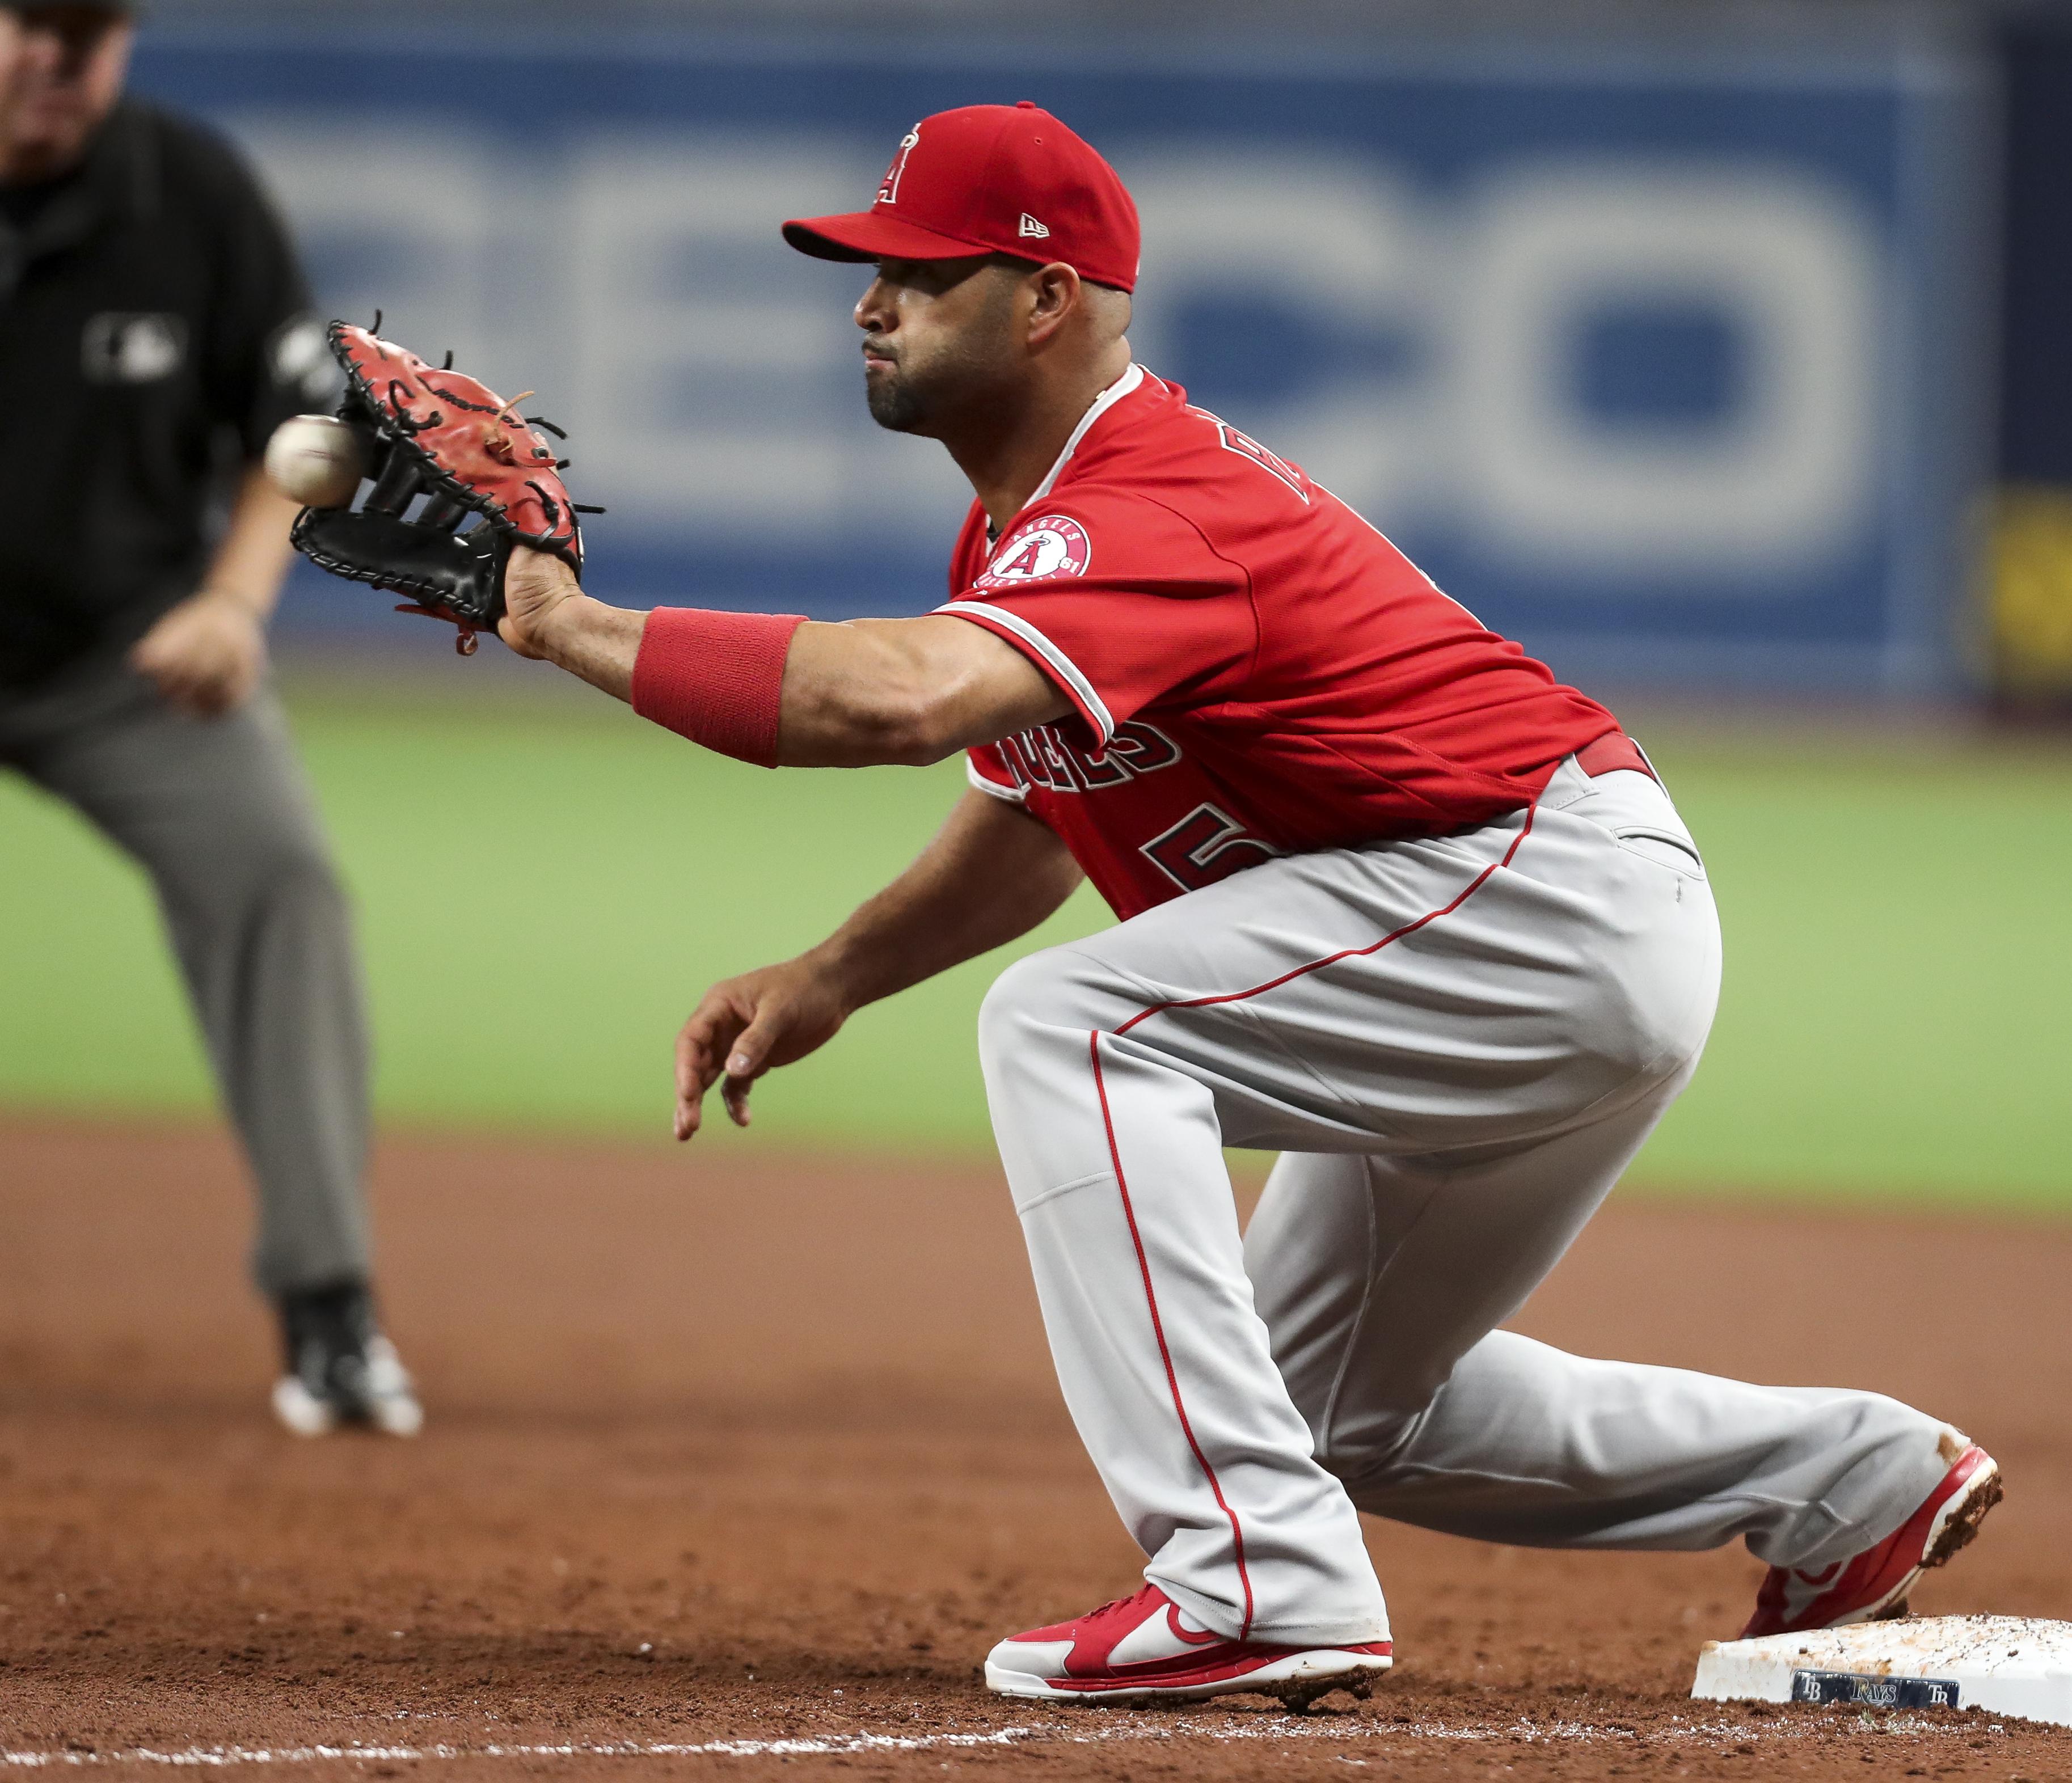 albert pujols career baseball angels angeles baseman celebrated needs rays herndon inning monica against friday second times during